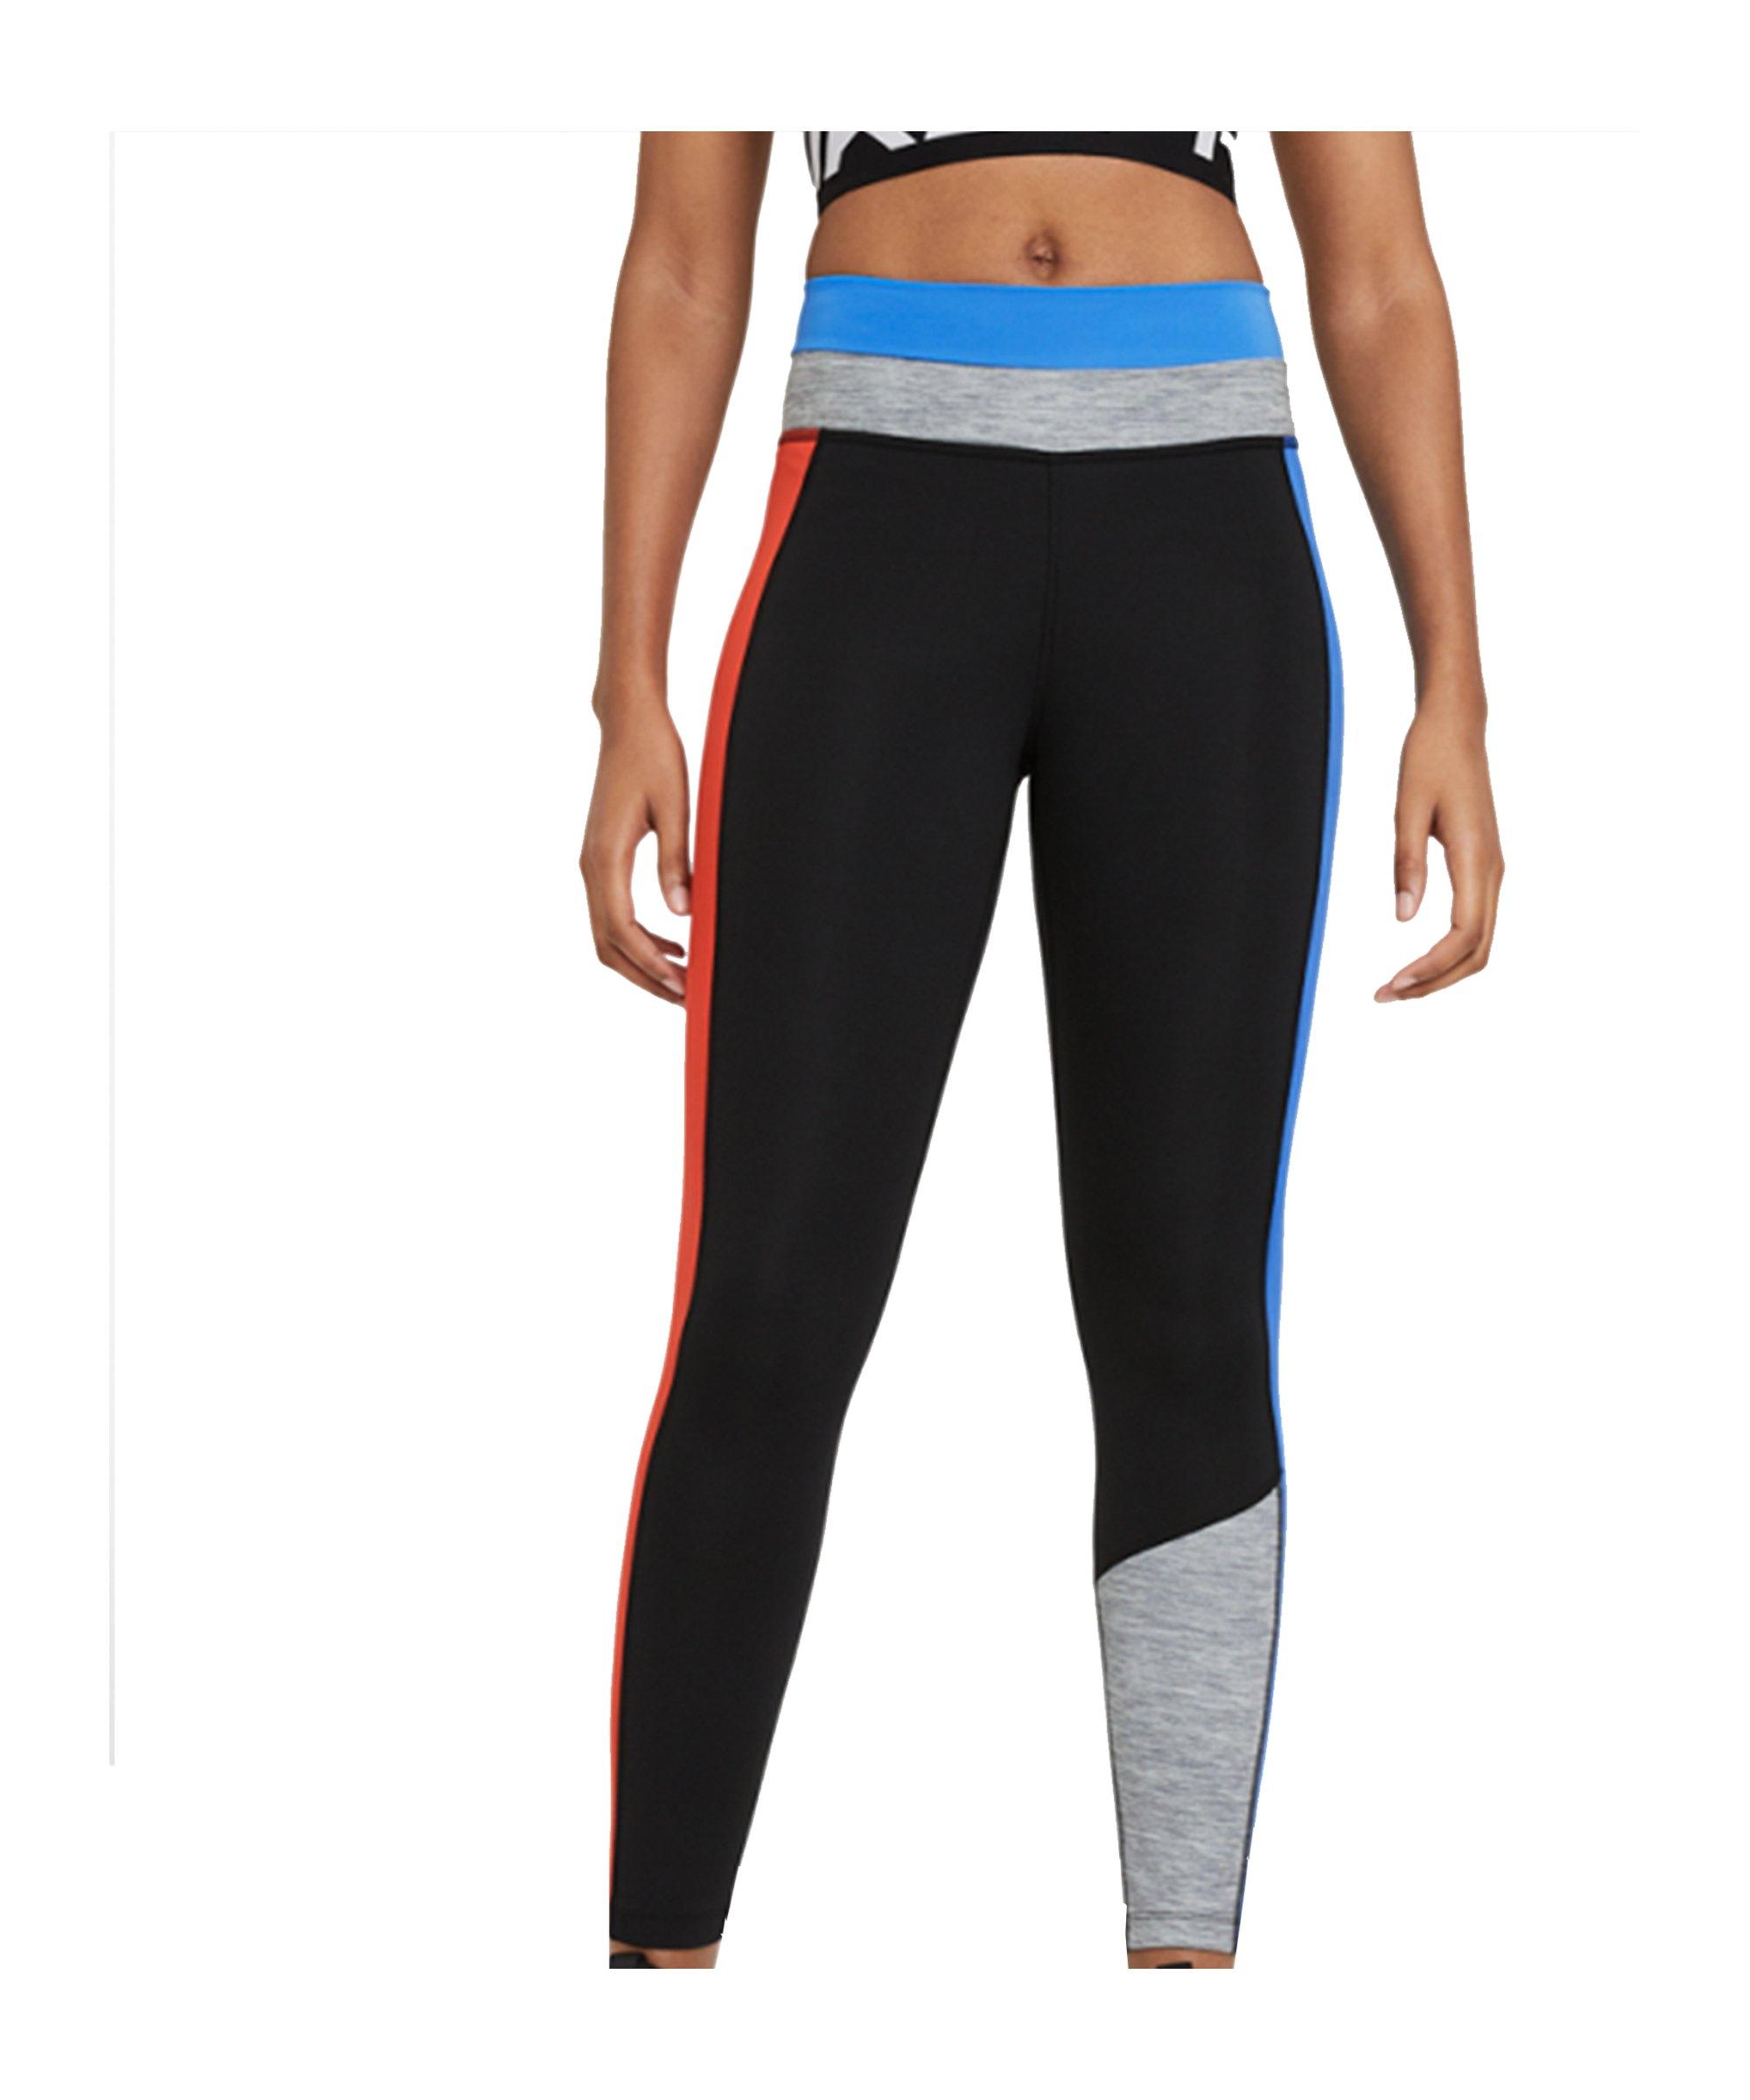 Nike One 7/8 CLRBLK Leggings Training Damen F011 - schwarz